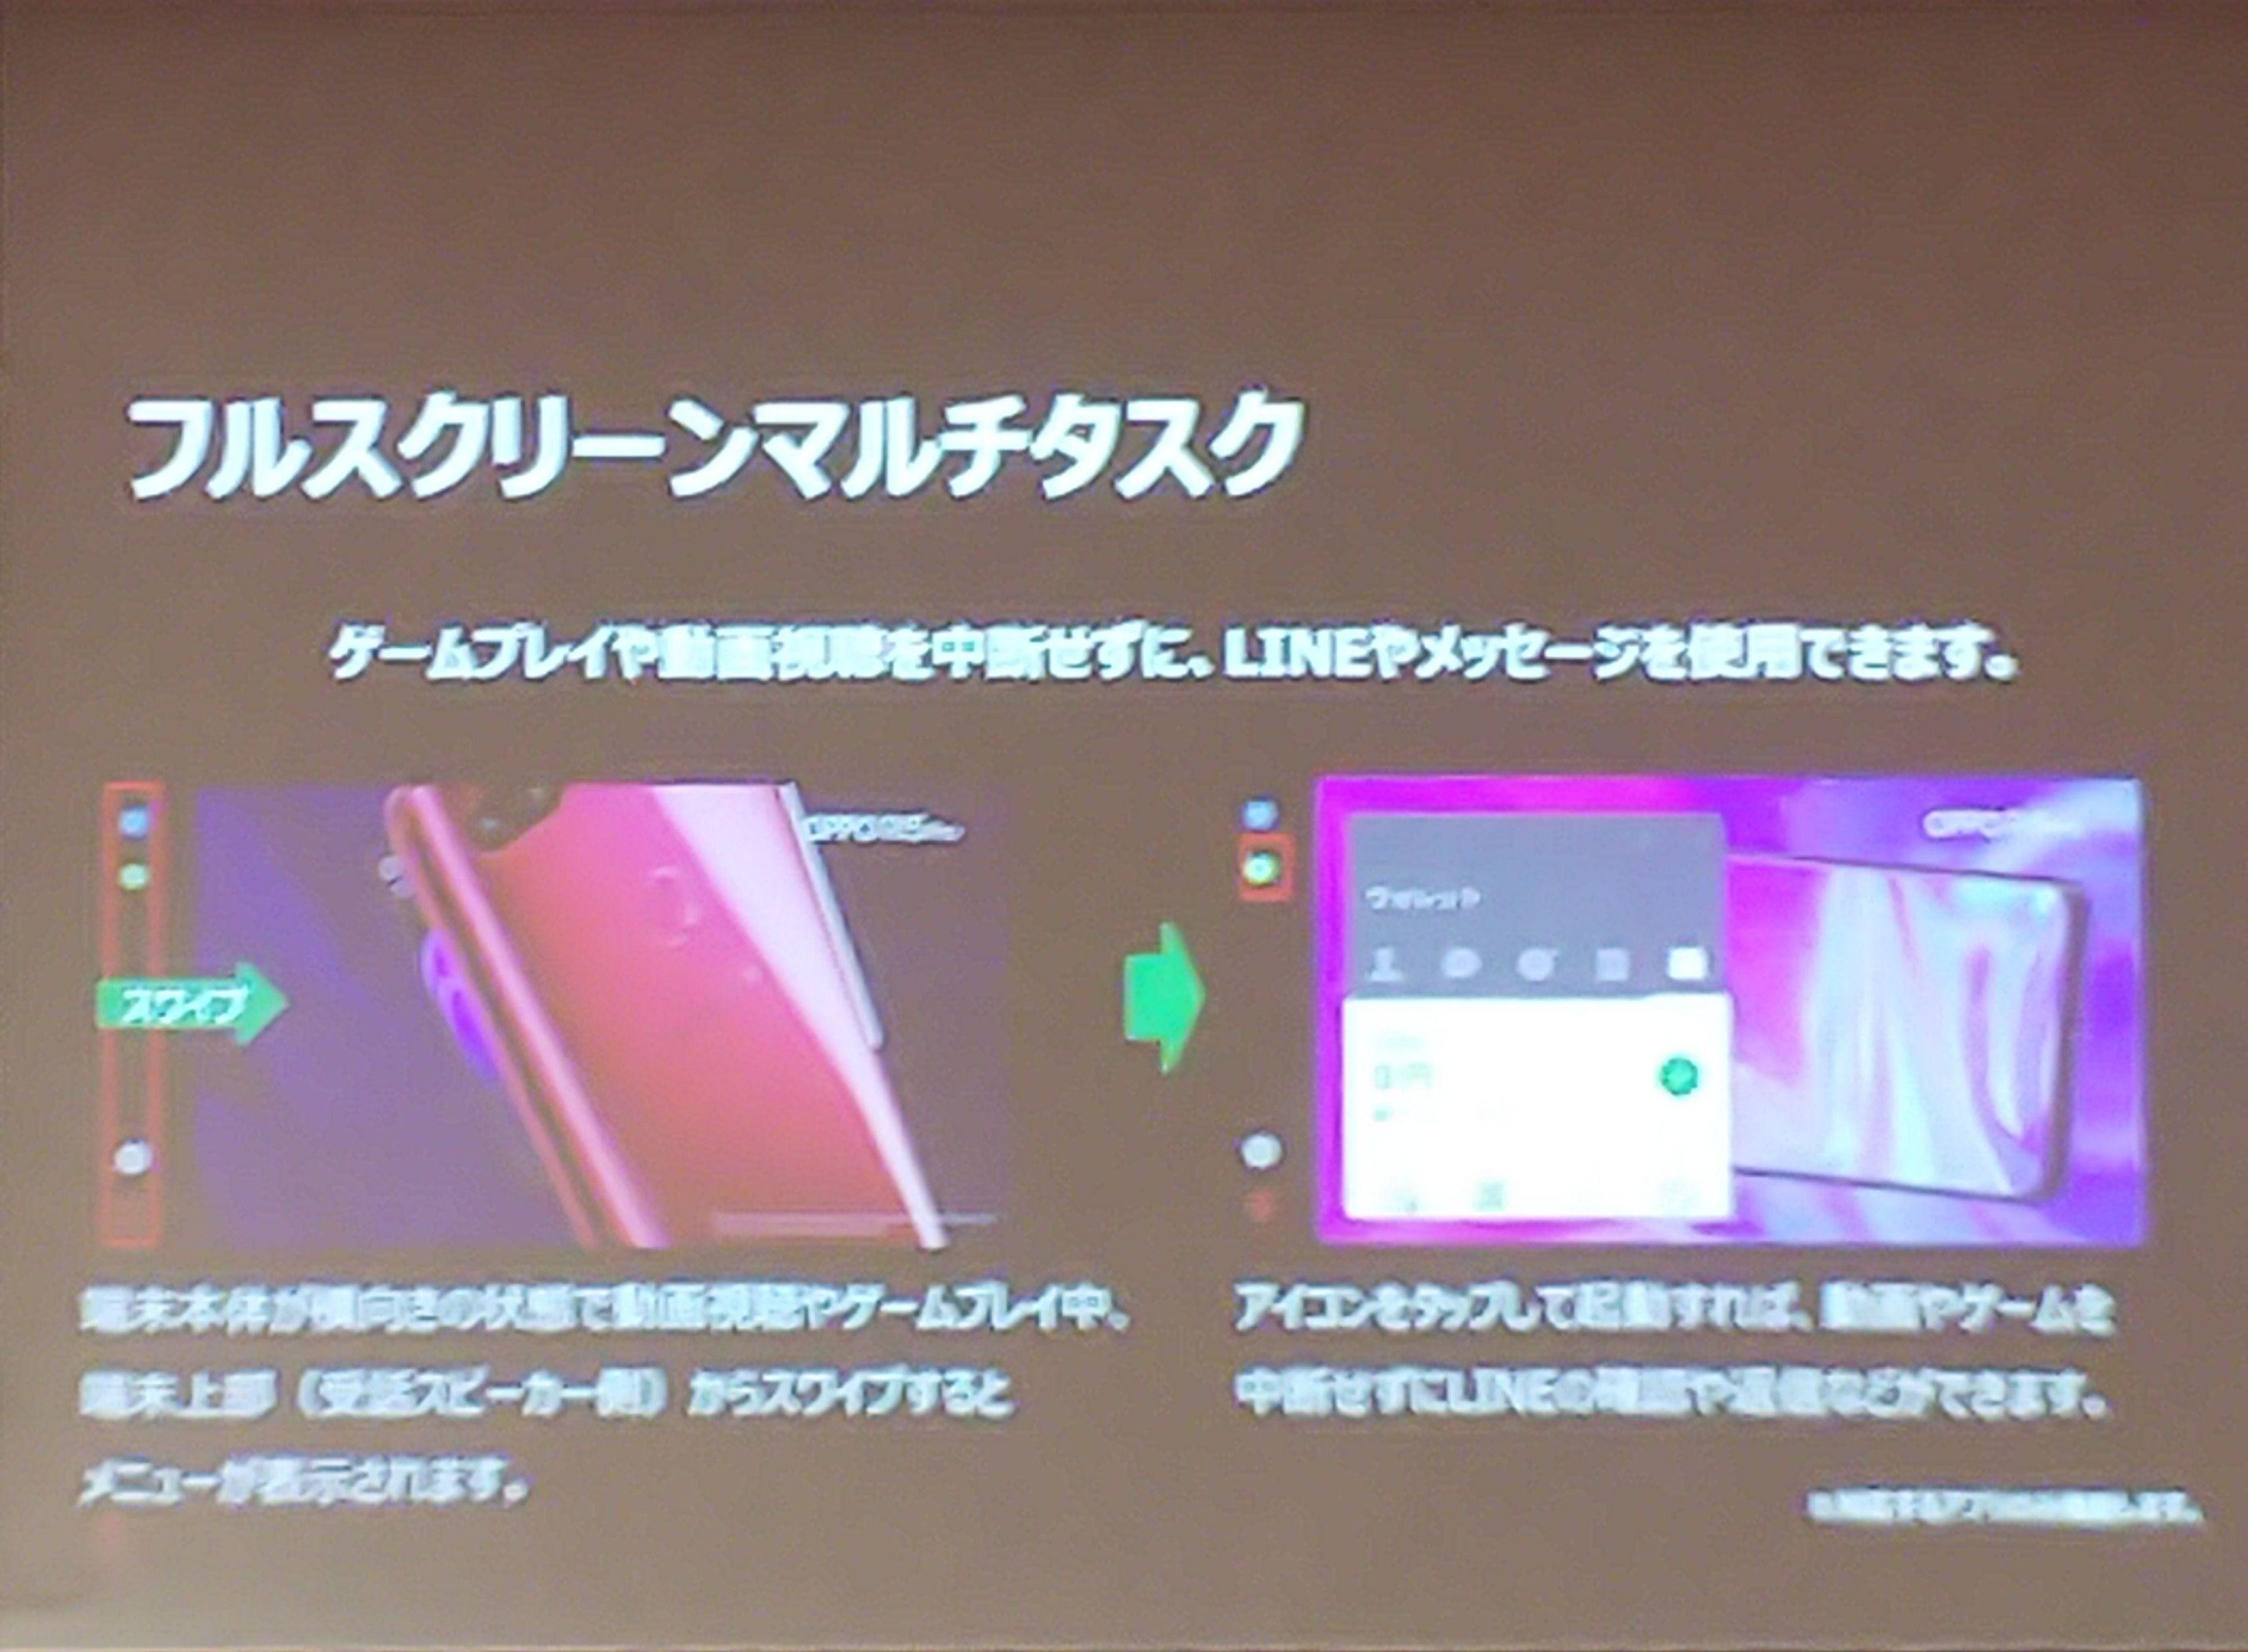 「Find X」体験イベント_フルスクリーンマルチタスク